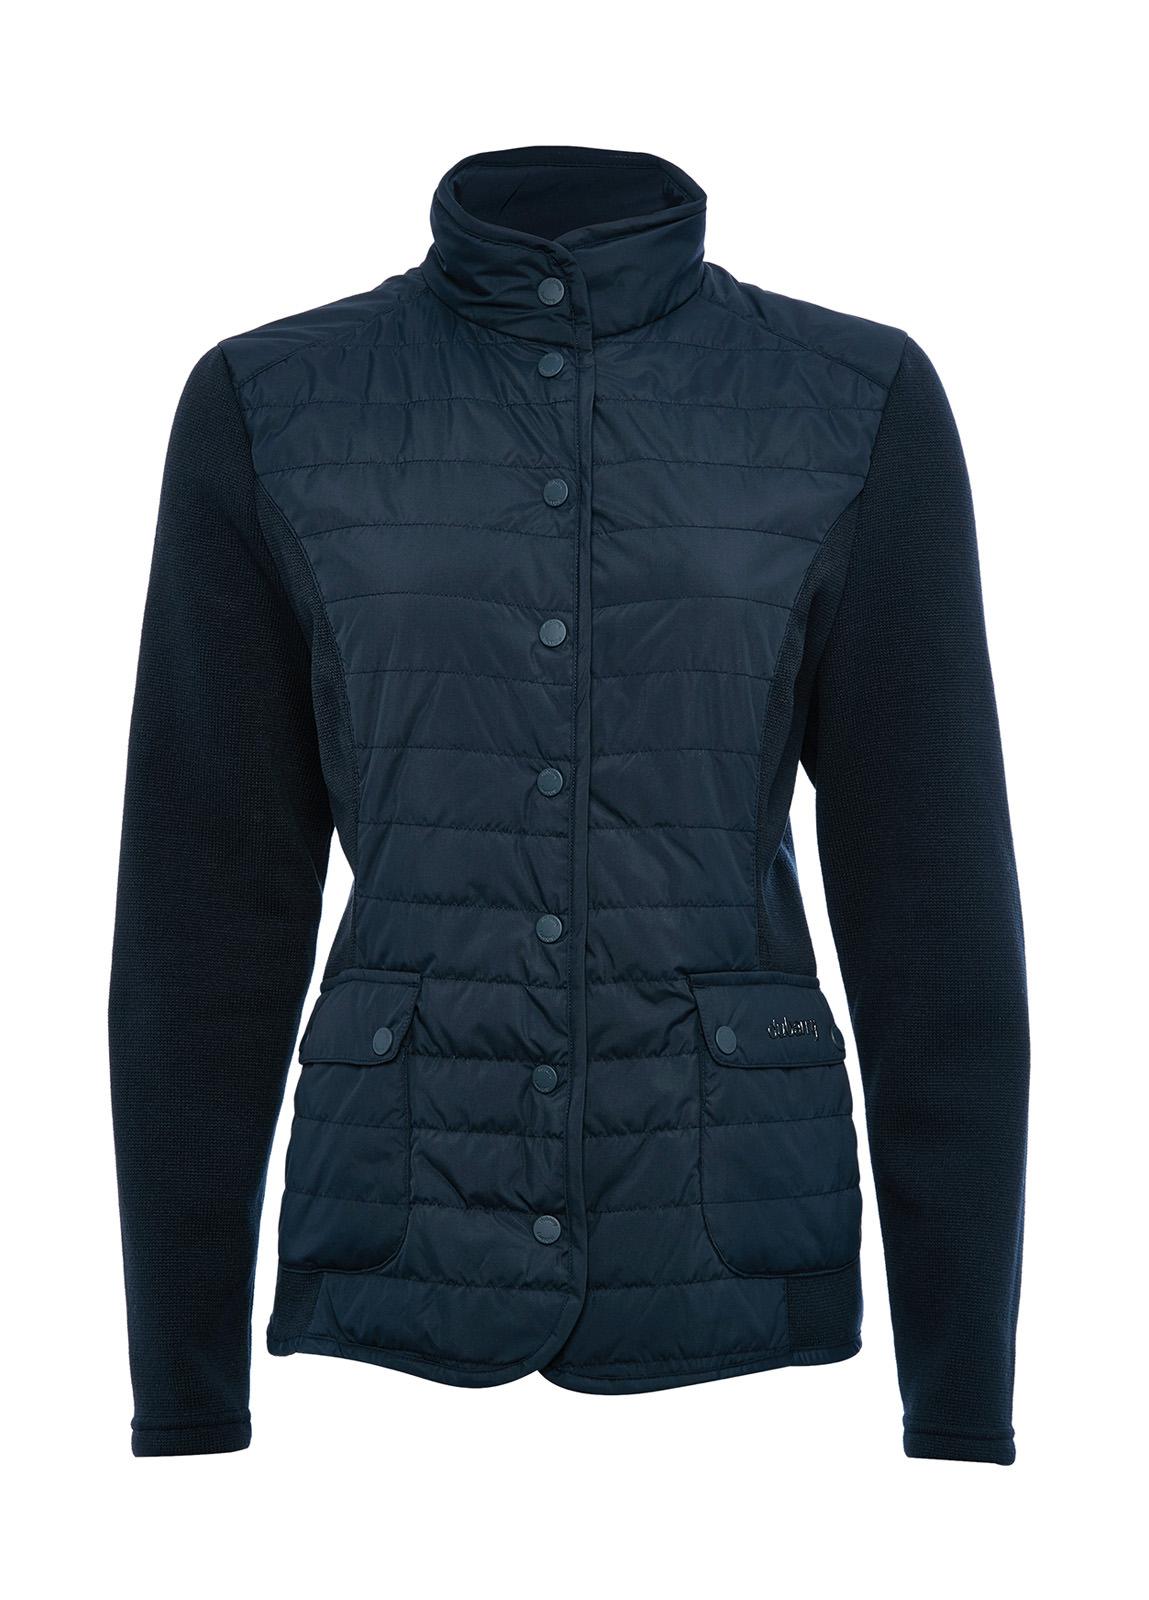 Terryglass jacket - Navy